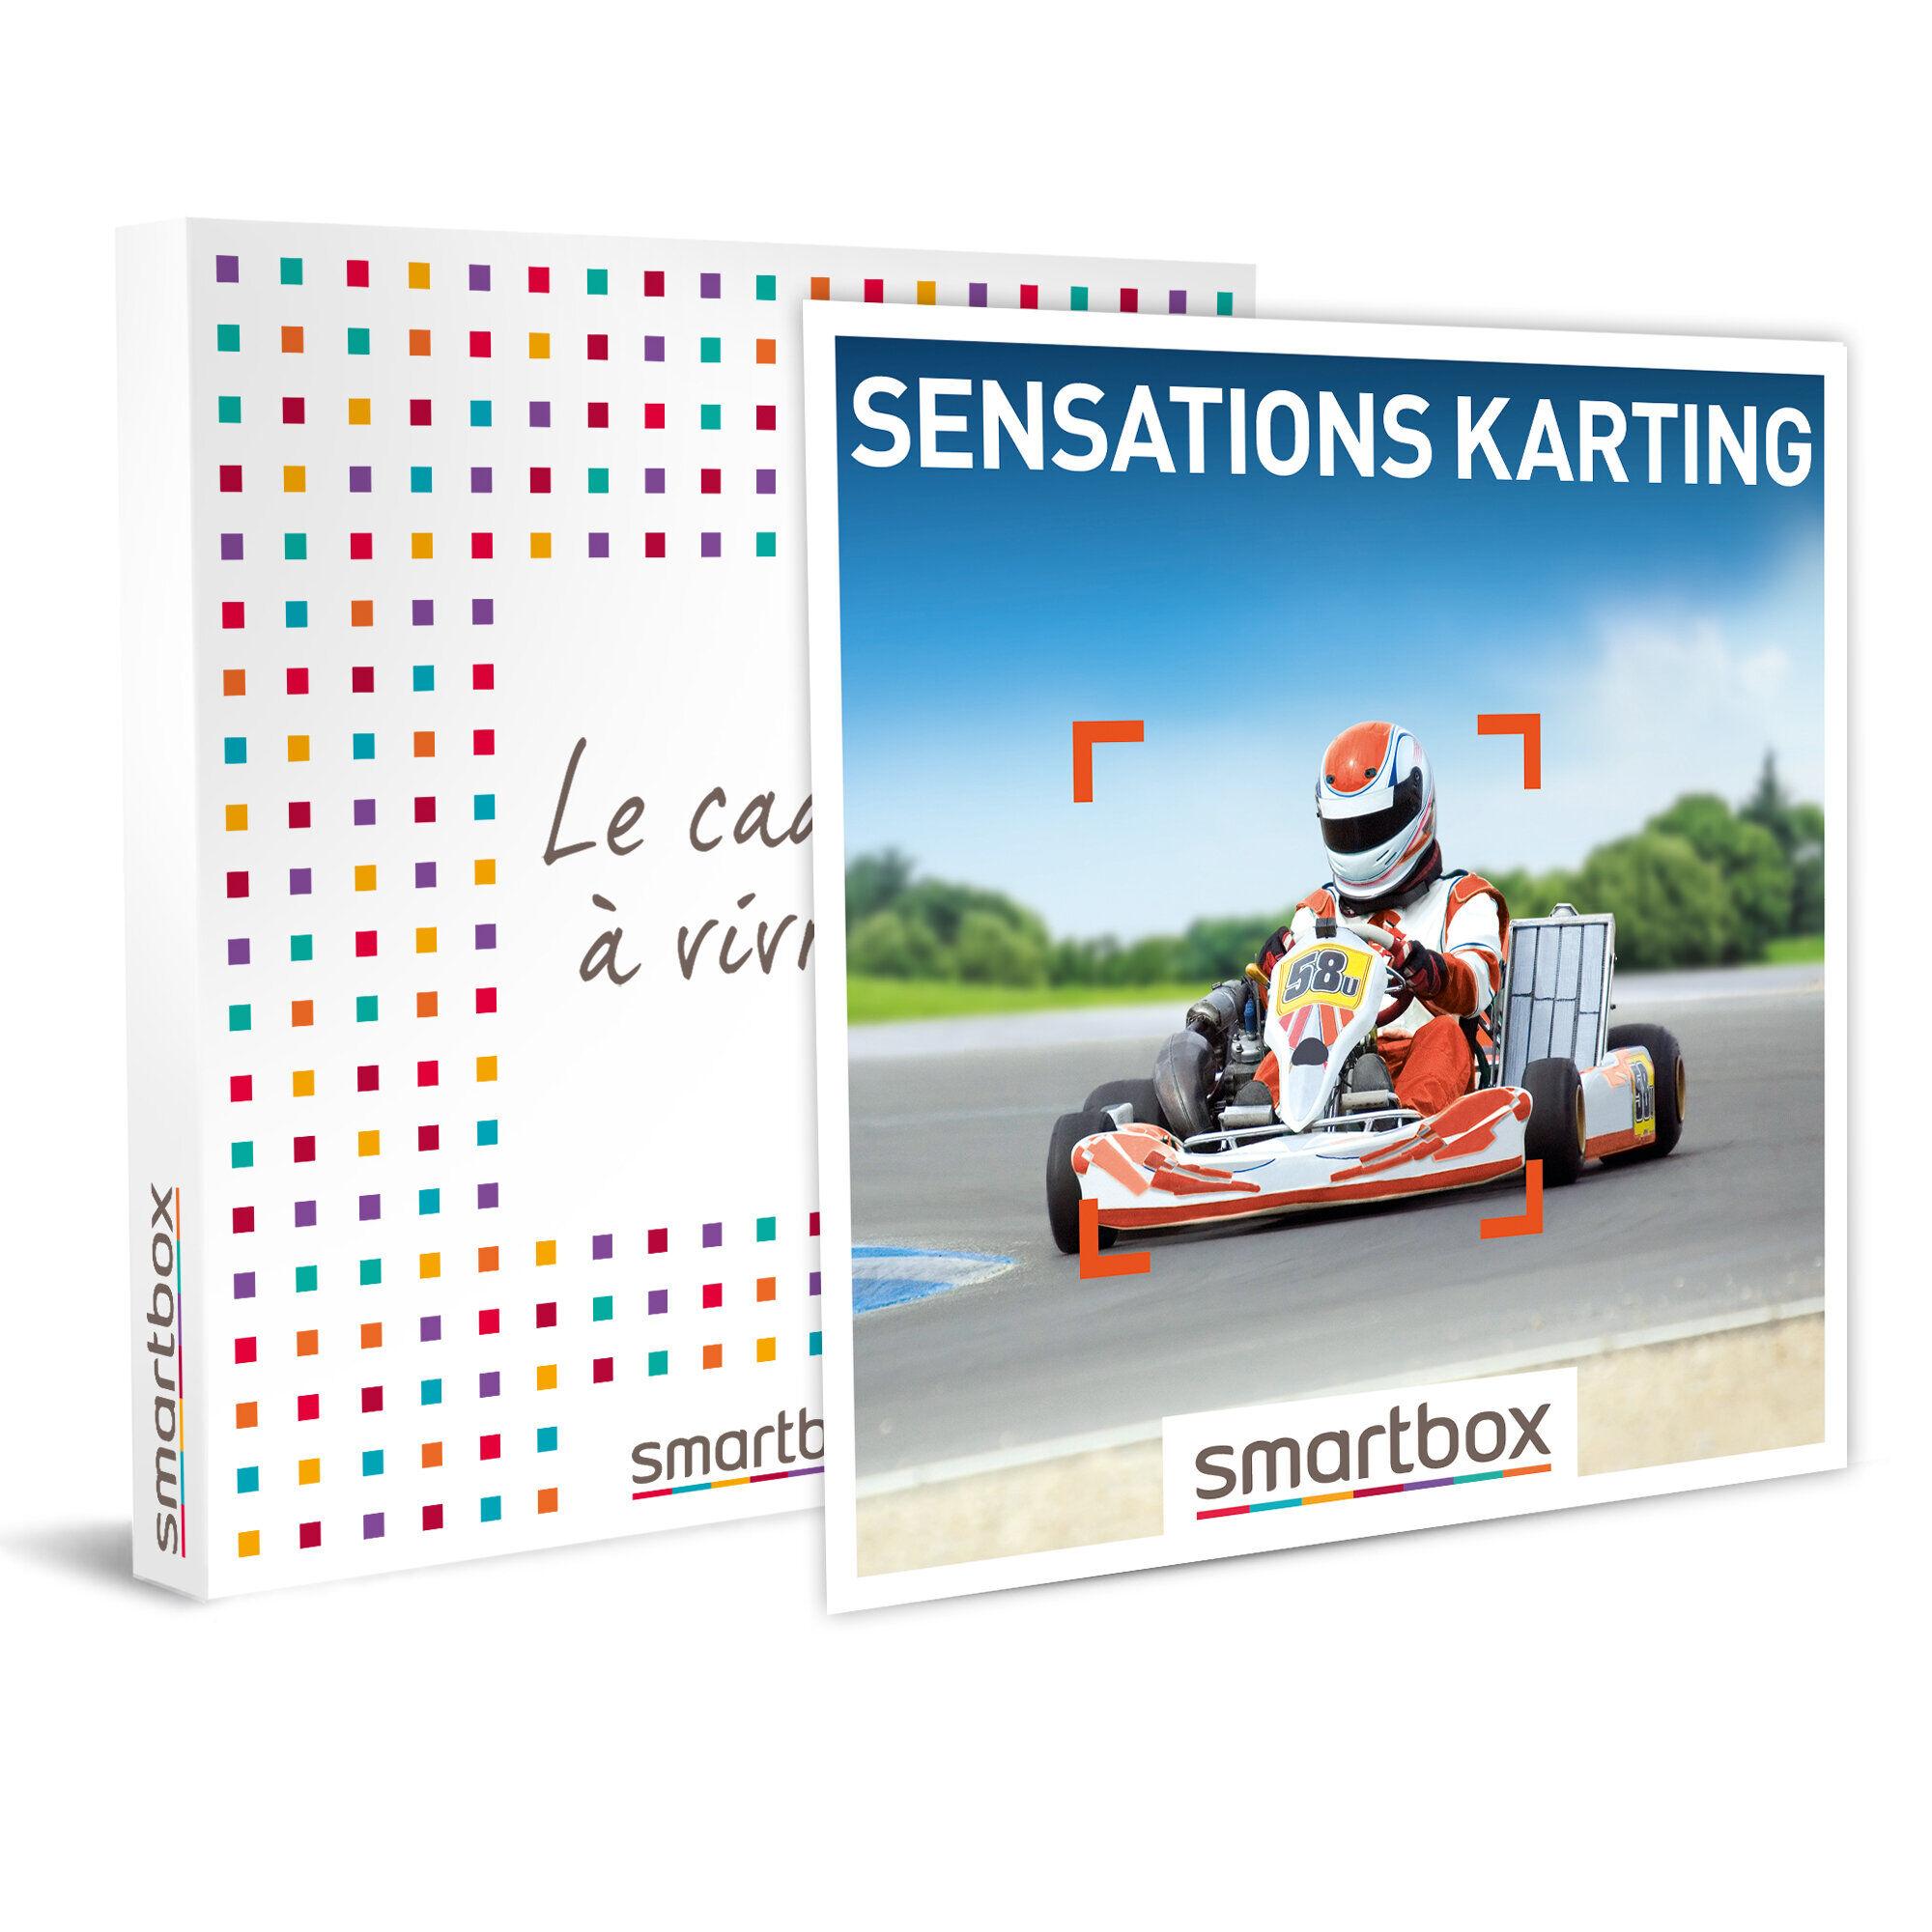 Smartbox Sensations karting Coffret cadeau Smartbox